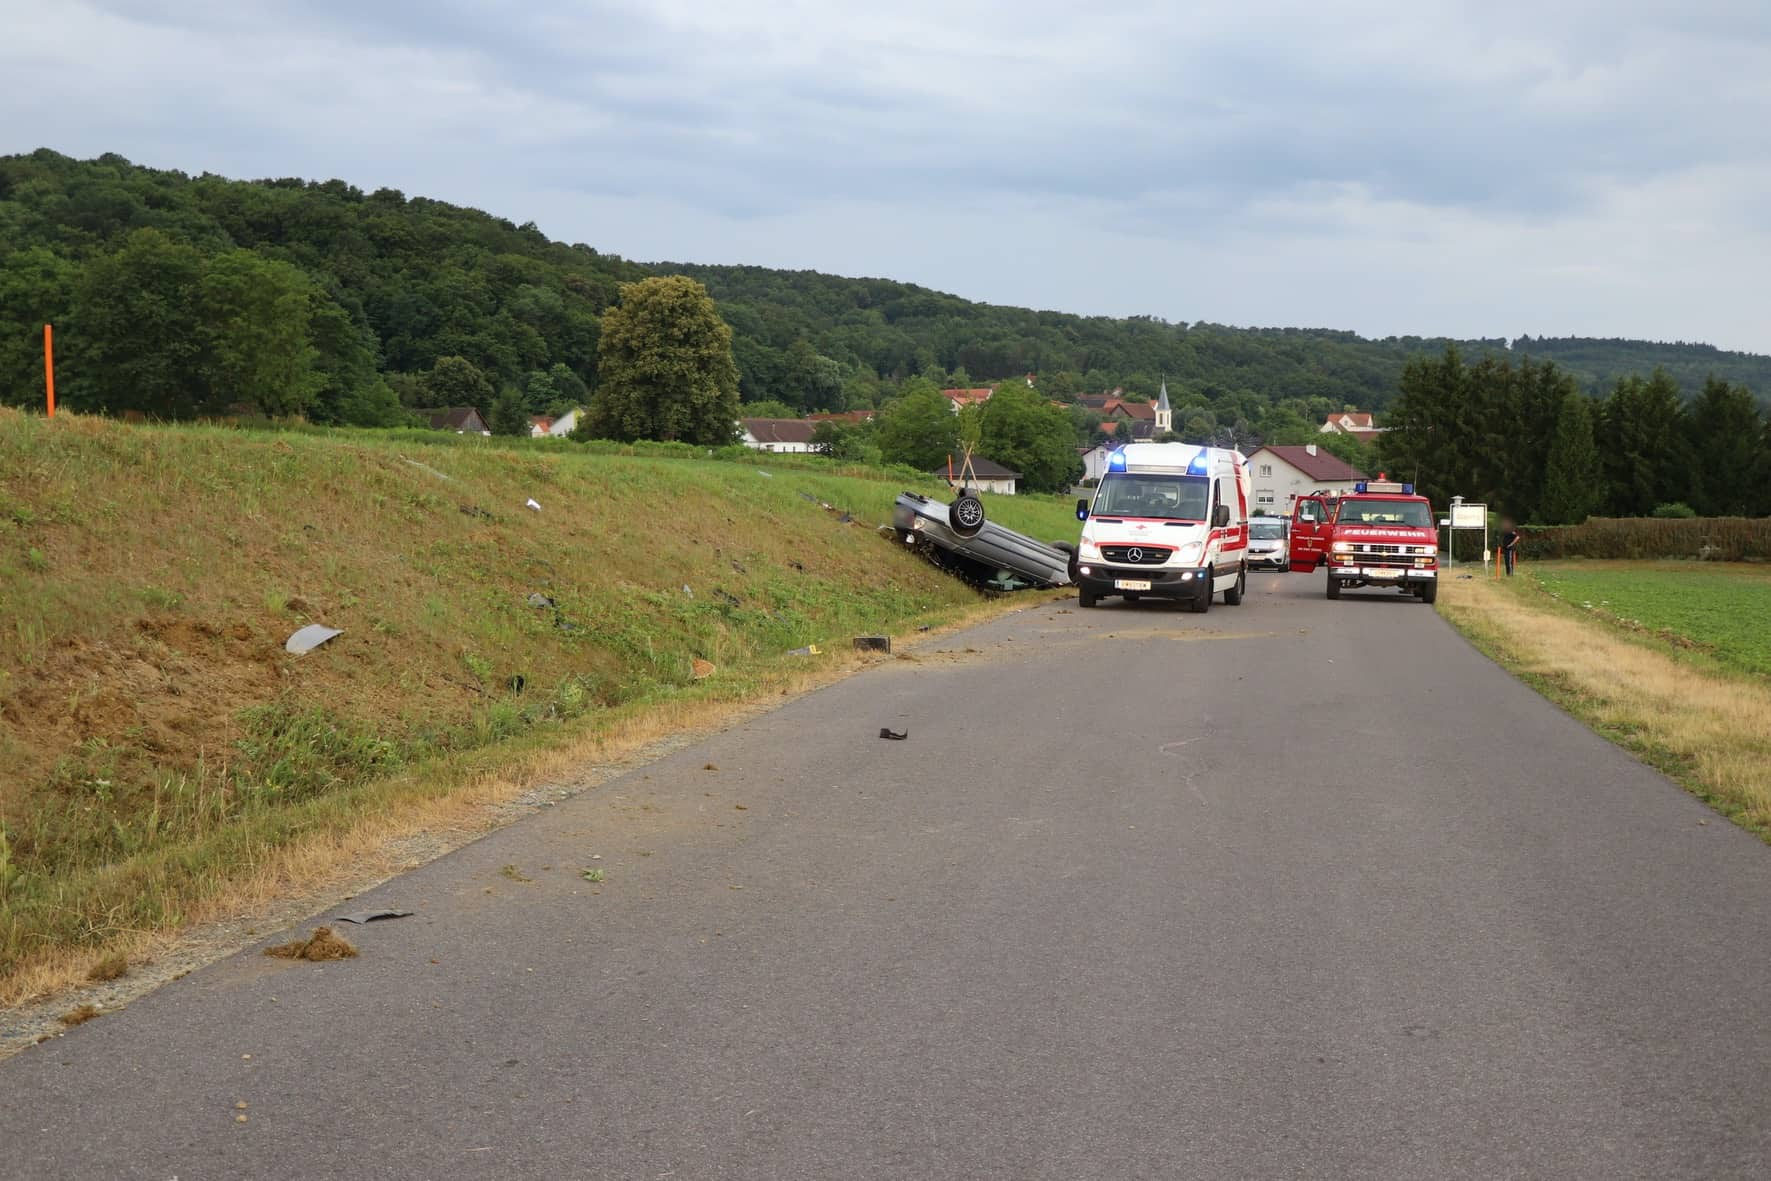 Schwerer Verkehrsunfall auf der L400 Glasing